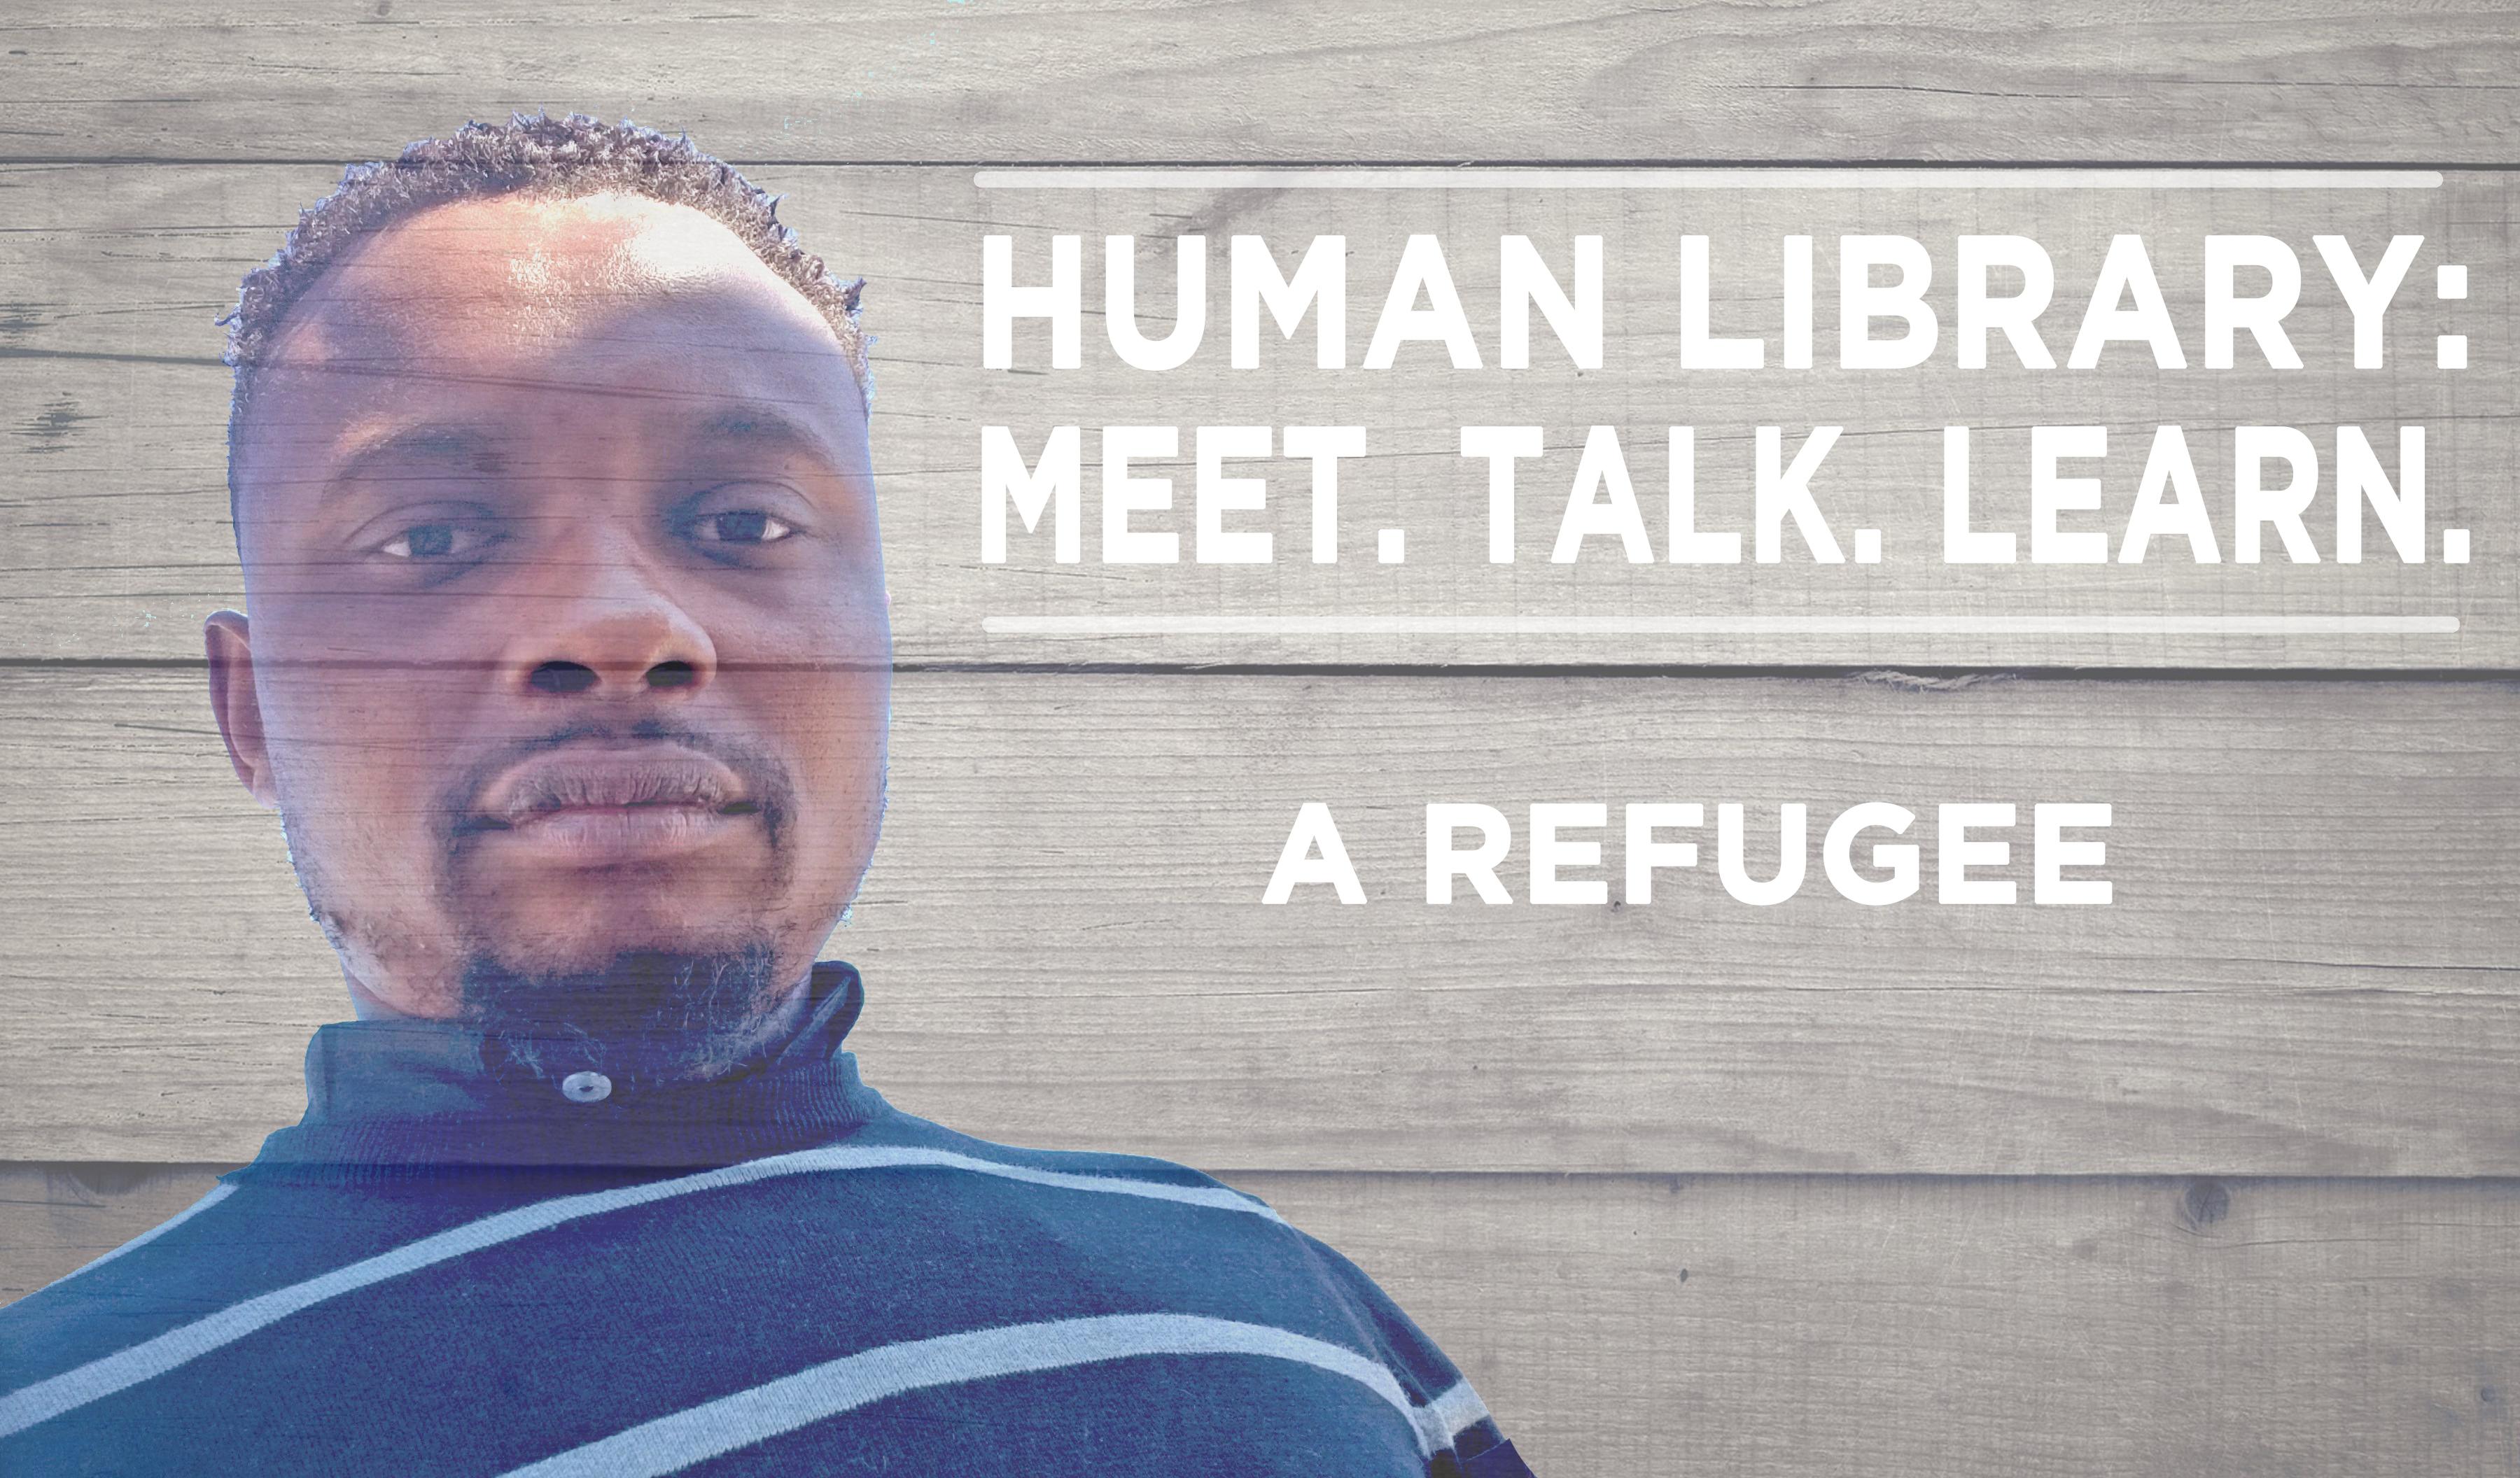 Human Library Logo2 - Refugee